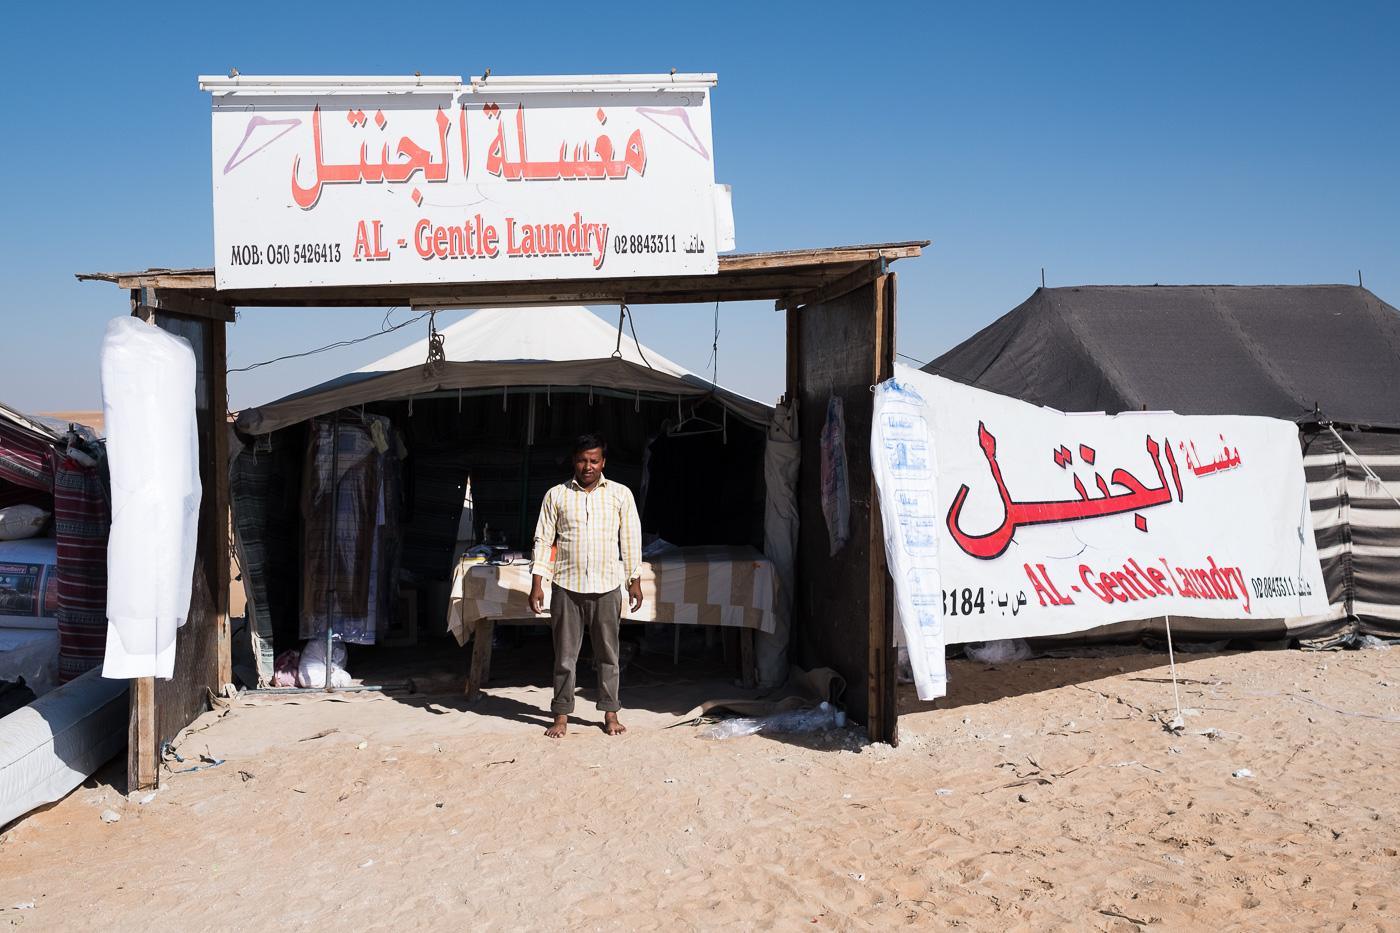 The Camel Festival shops #1